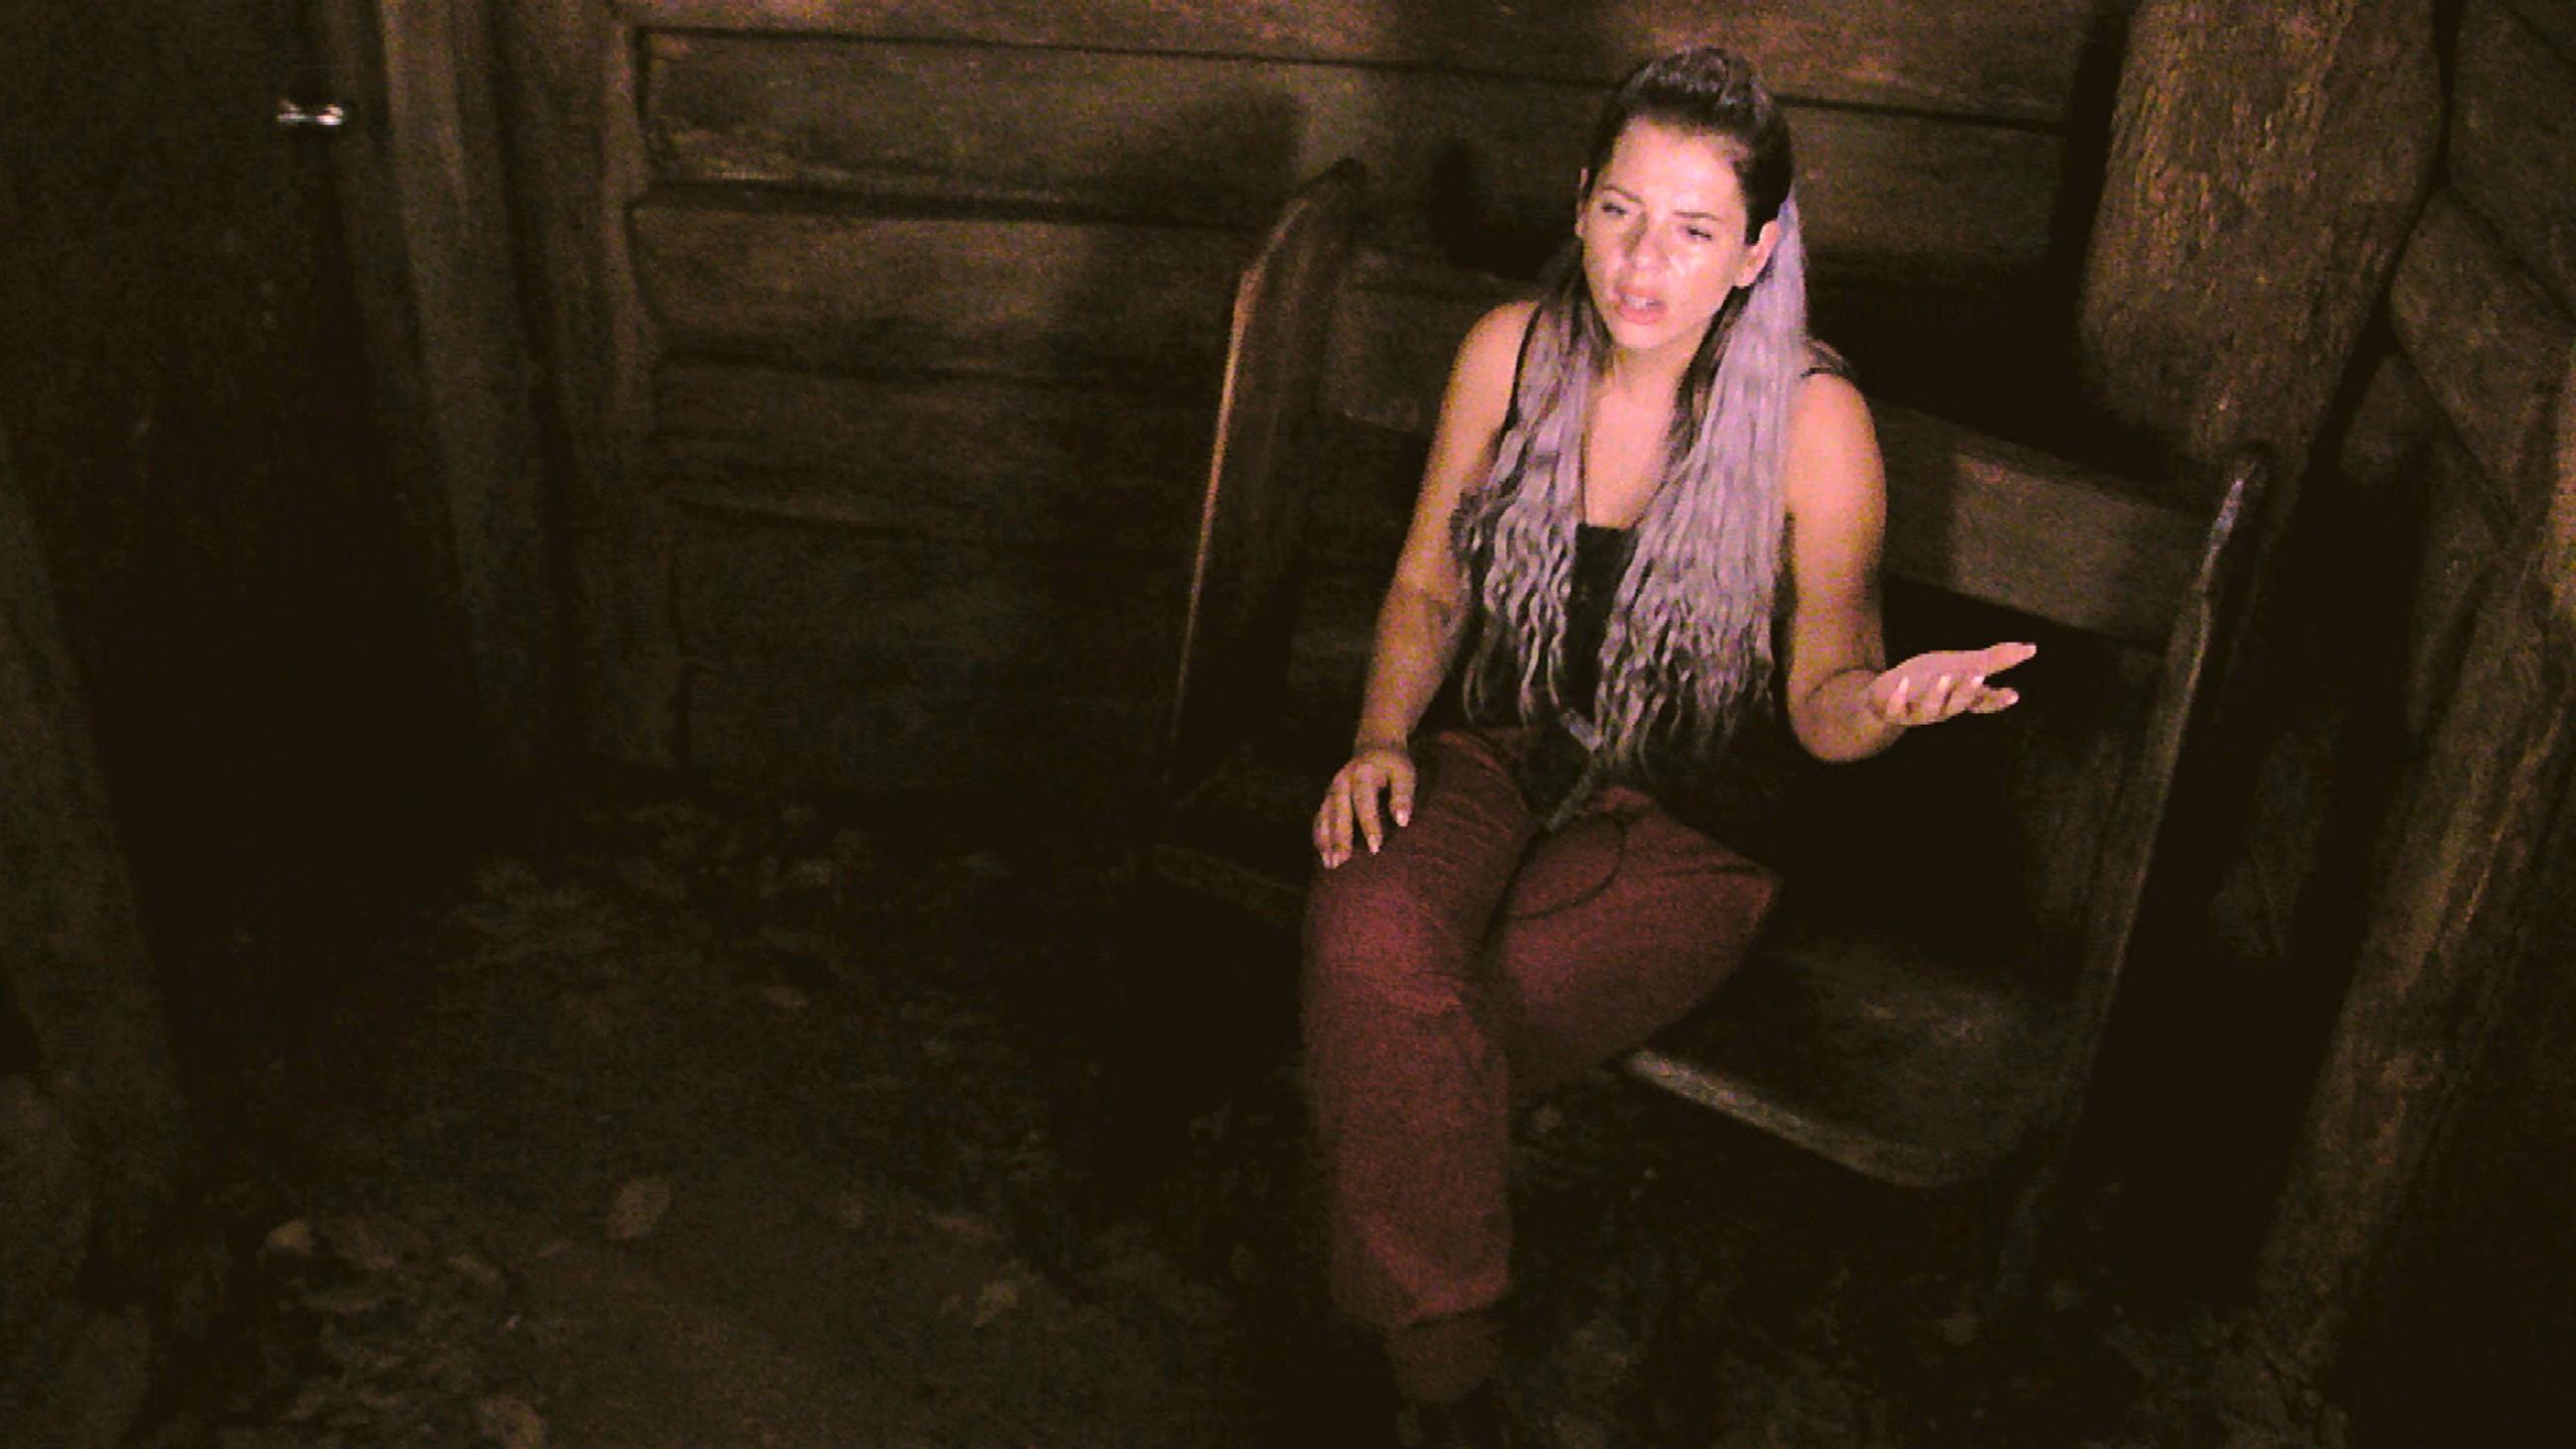 Dschungelcamp 2018 Tag 8 - Jenny Frankhauser